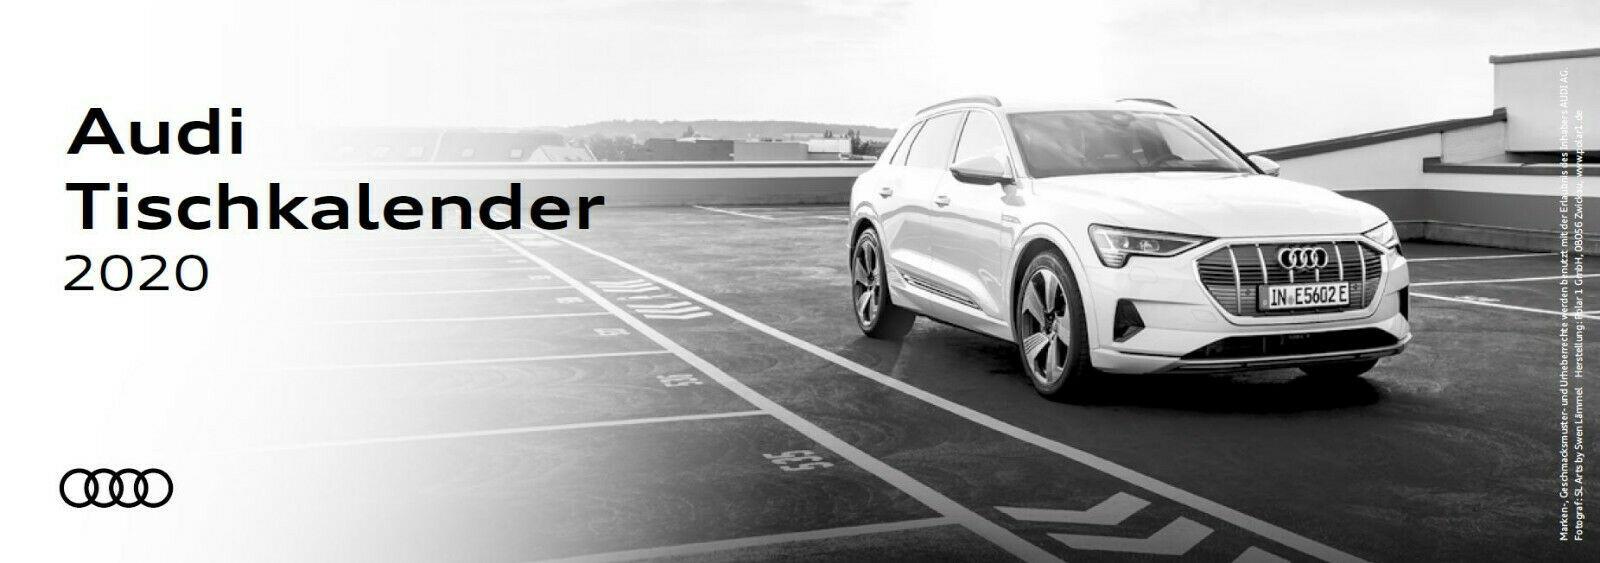 Audi Tischkalender 2020 Kalender Calender Bürokalender 3-Monats-Kalender